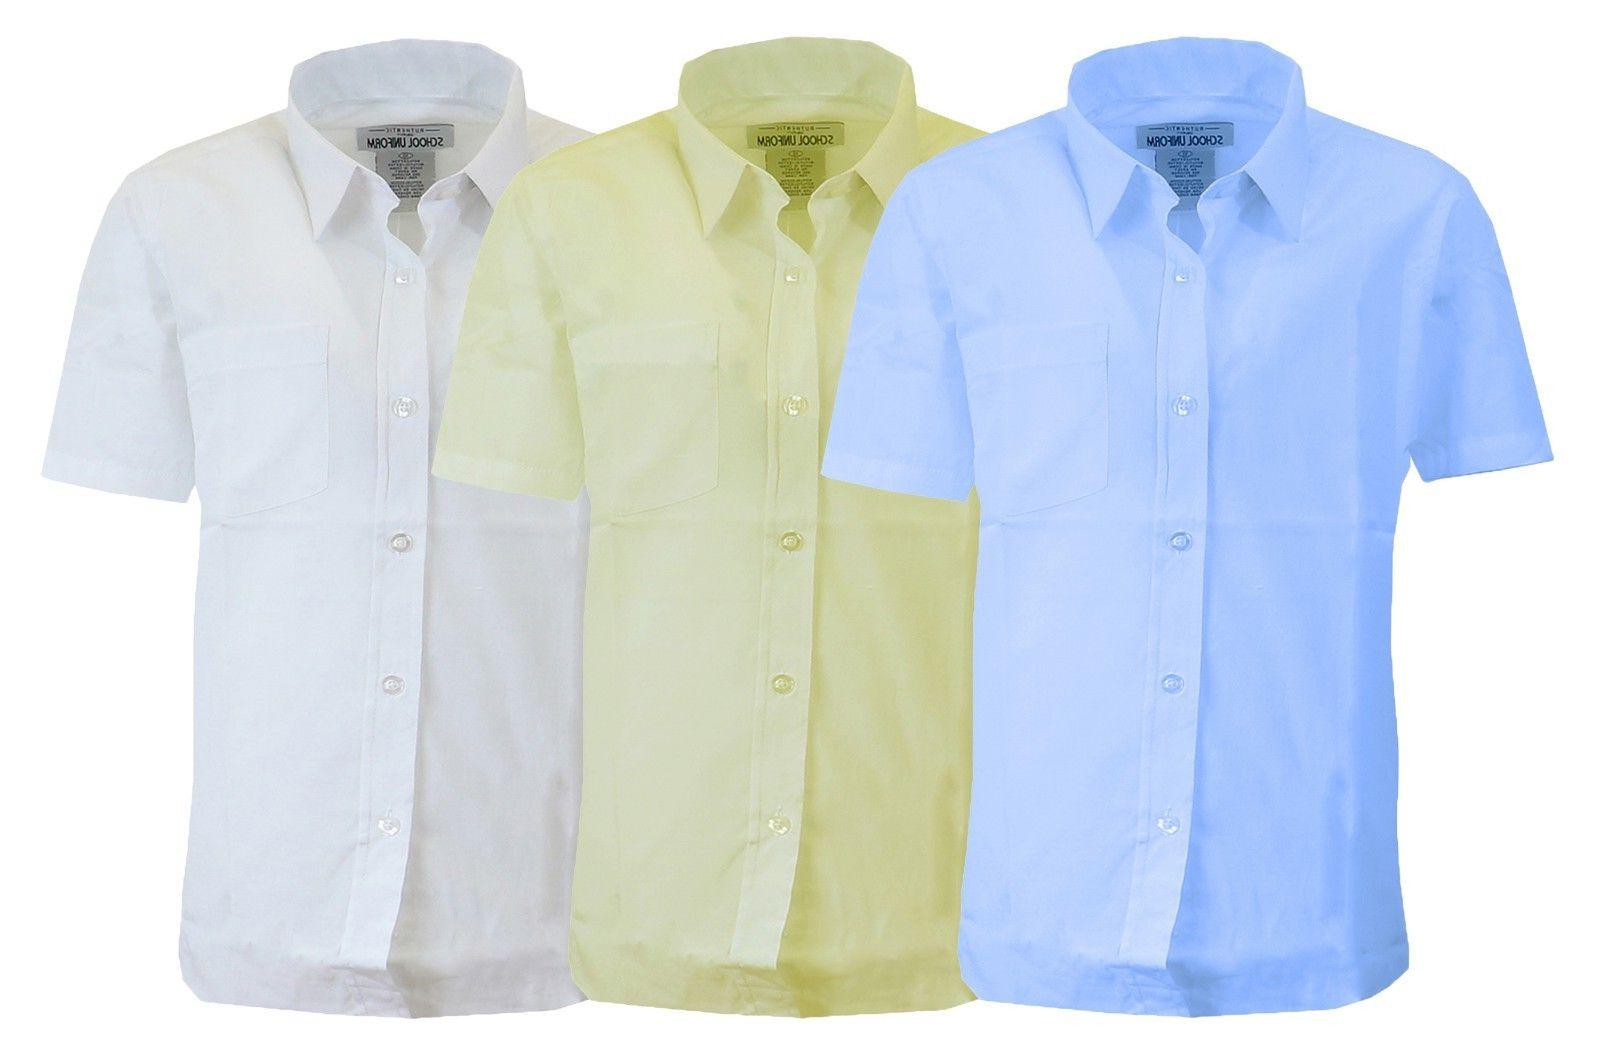 Boys Short Sleeve Uniform Shirts Casual School Button Colors